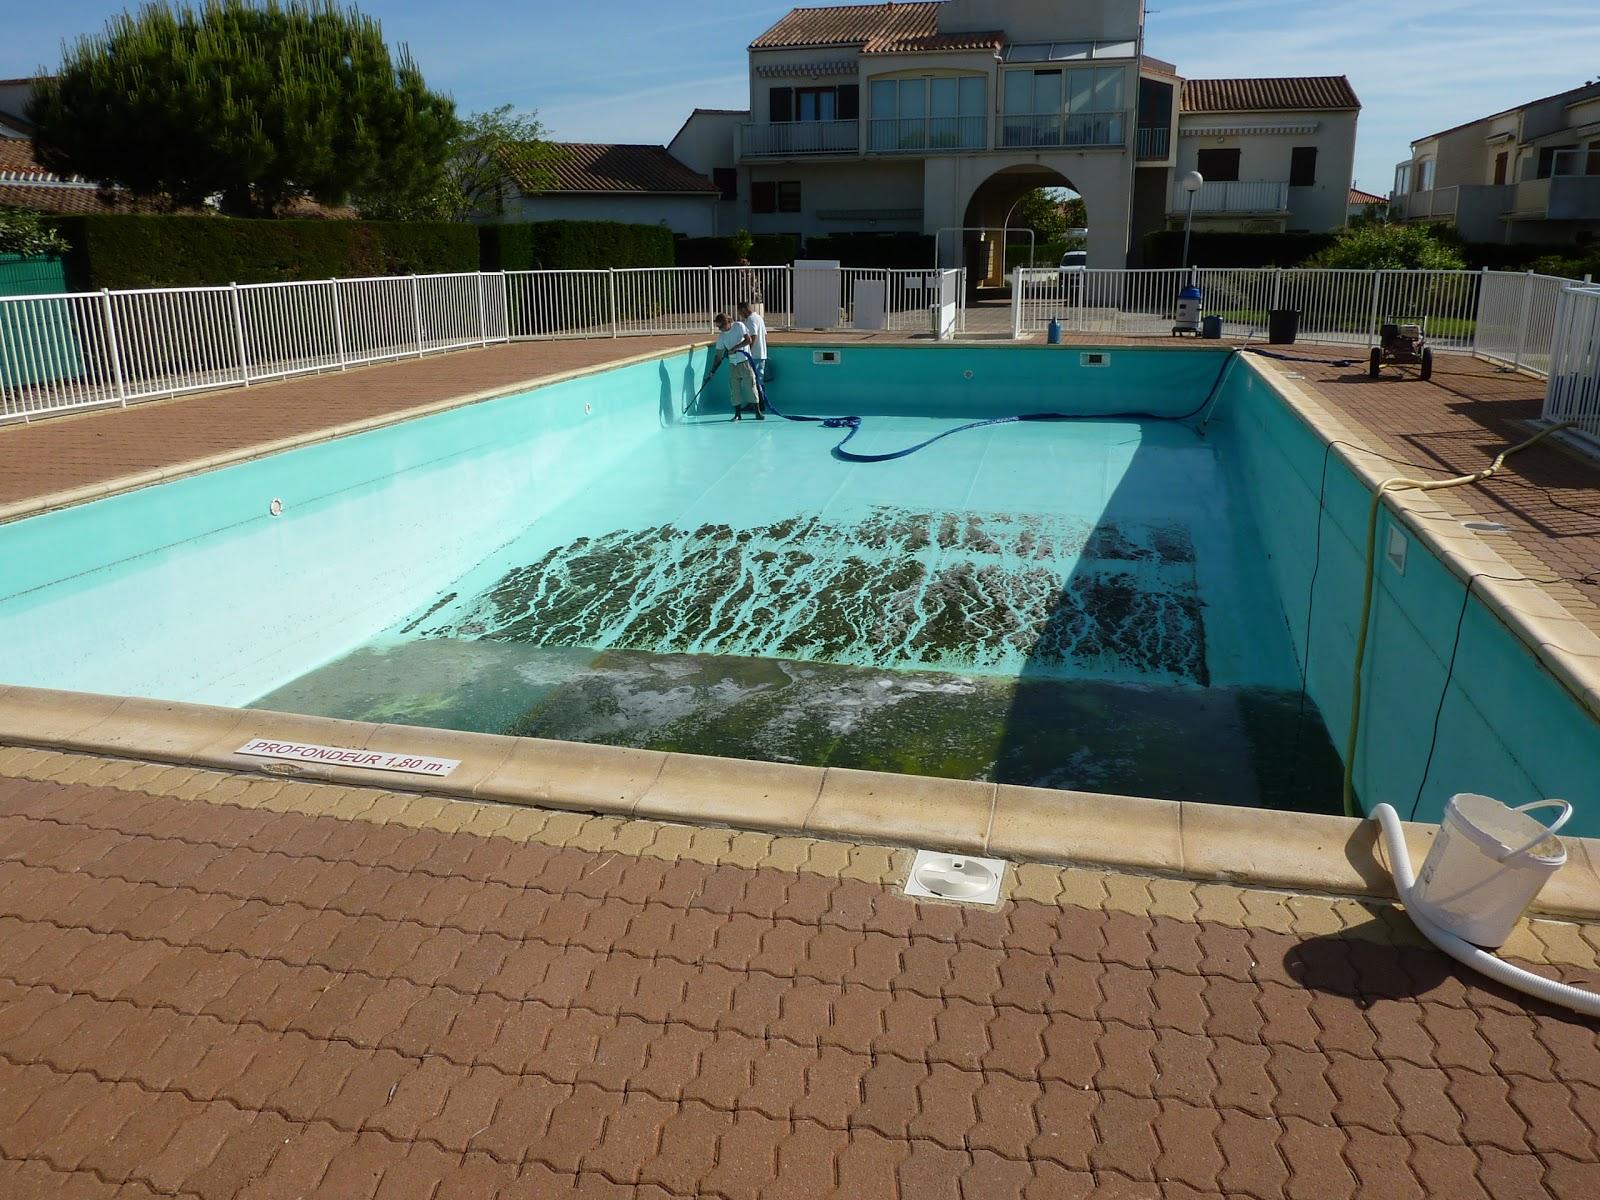 residence les soleils d 39 or mise en eau de la piscine. Black Bedroom Furniture Sets. Home Design Ideas